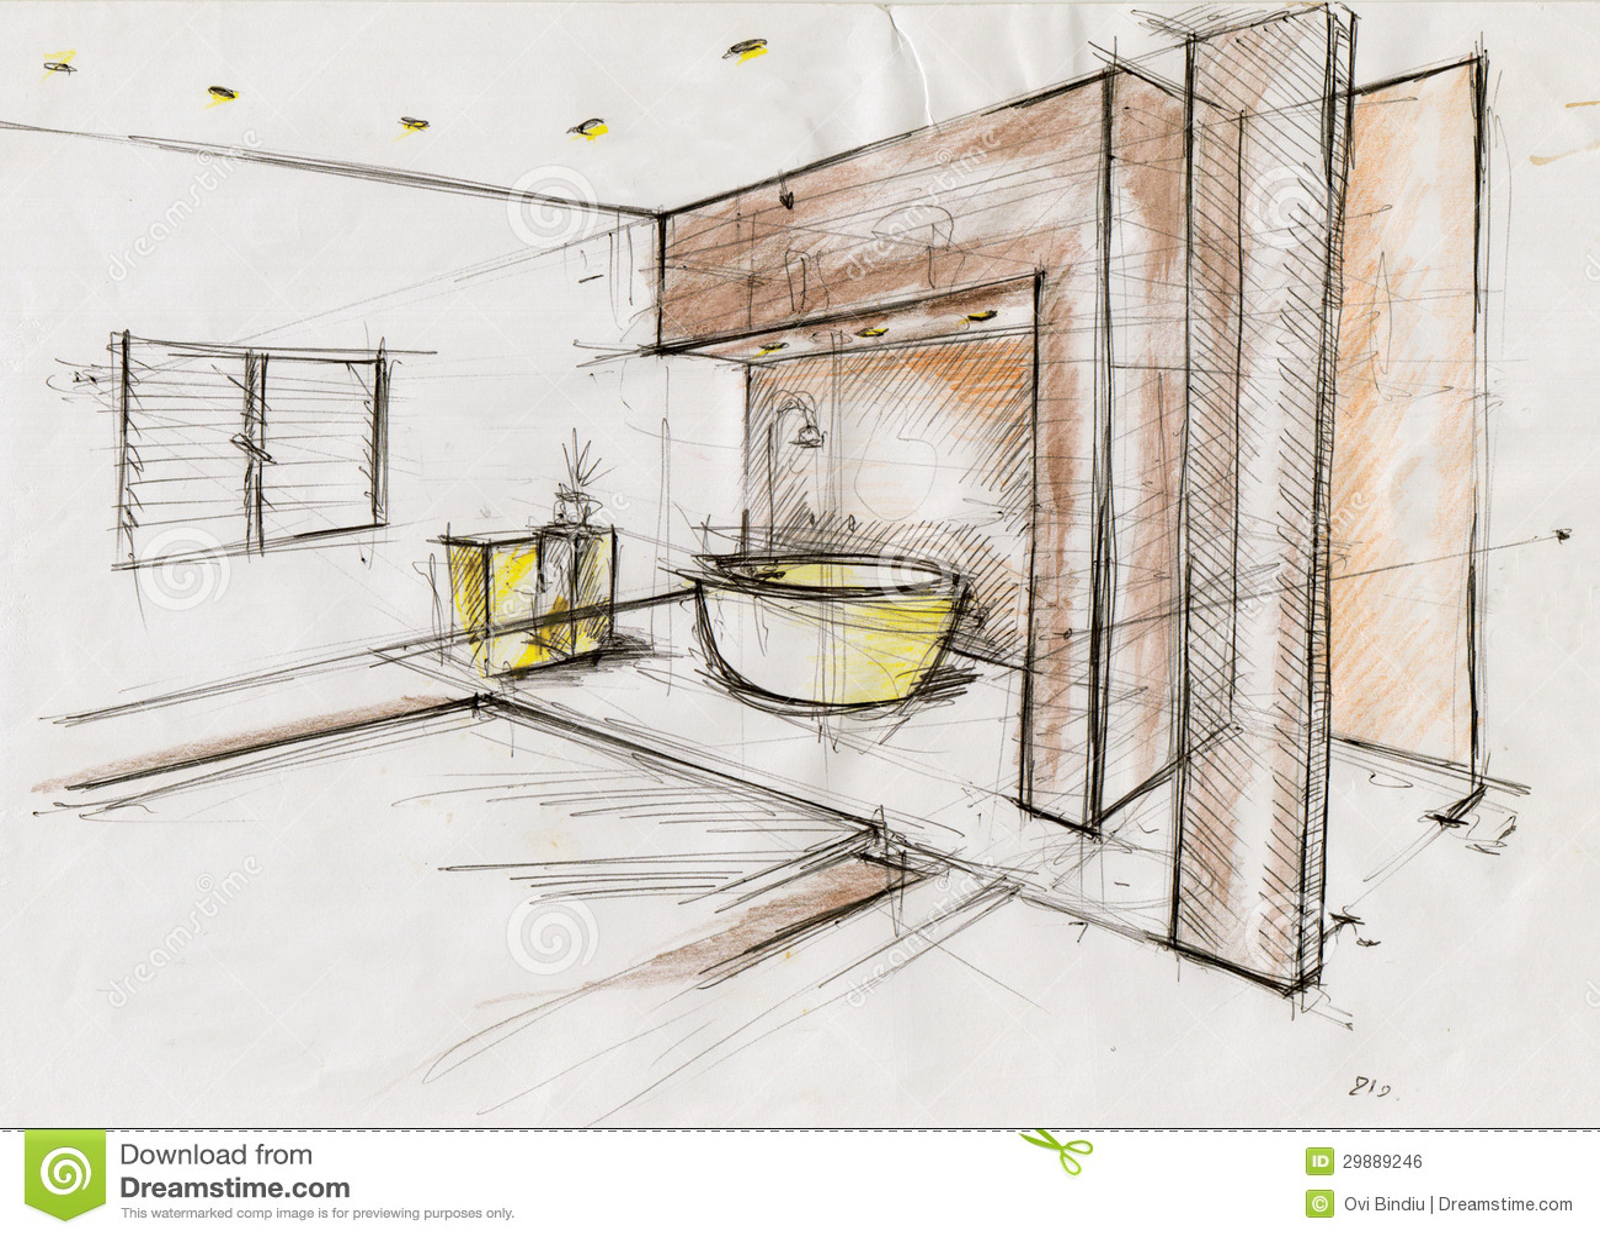 Candice Olson Bedroom Designs Sketch Illustration For Interior Design Royalty Free Stock